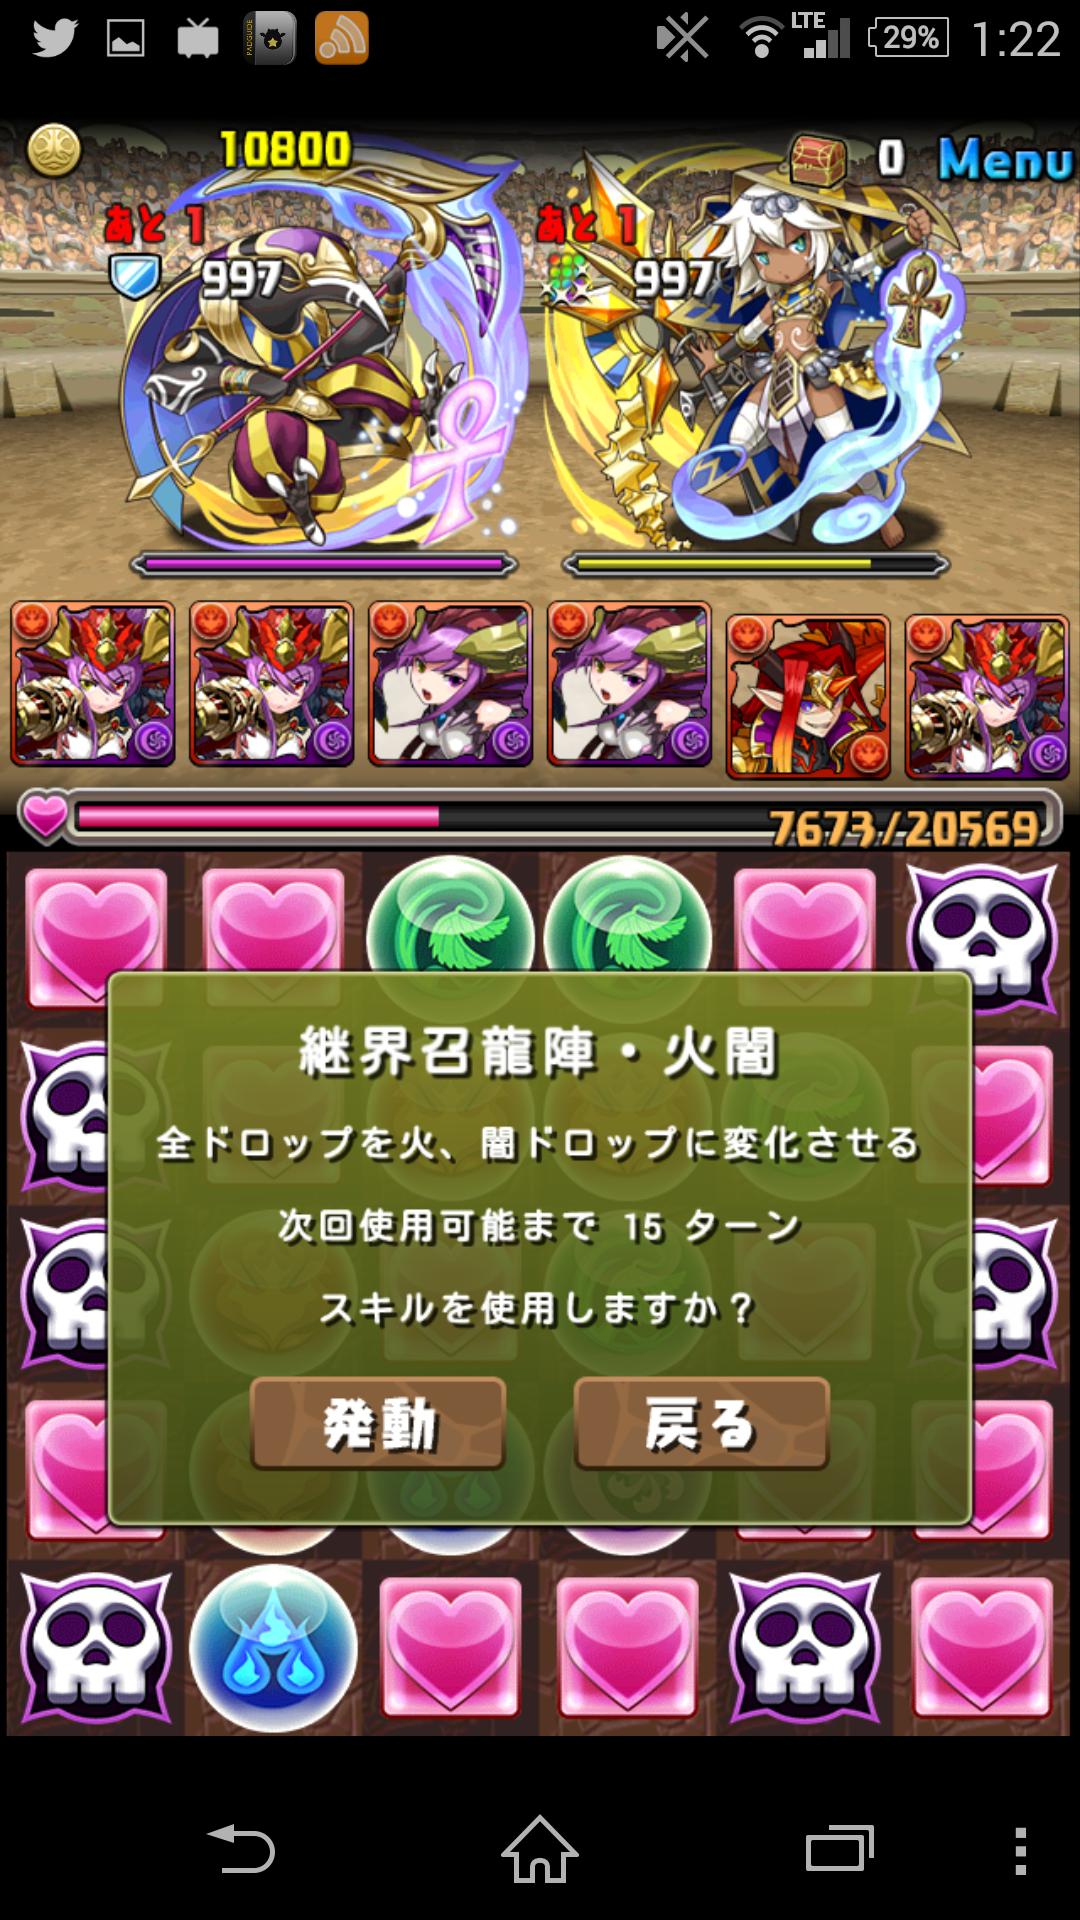 Screenshot_2015-02-11-01-22-28.png